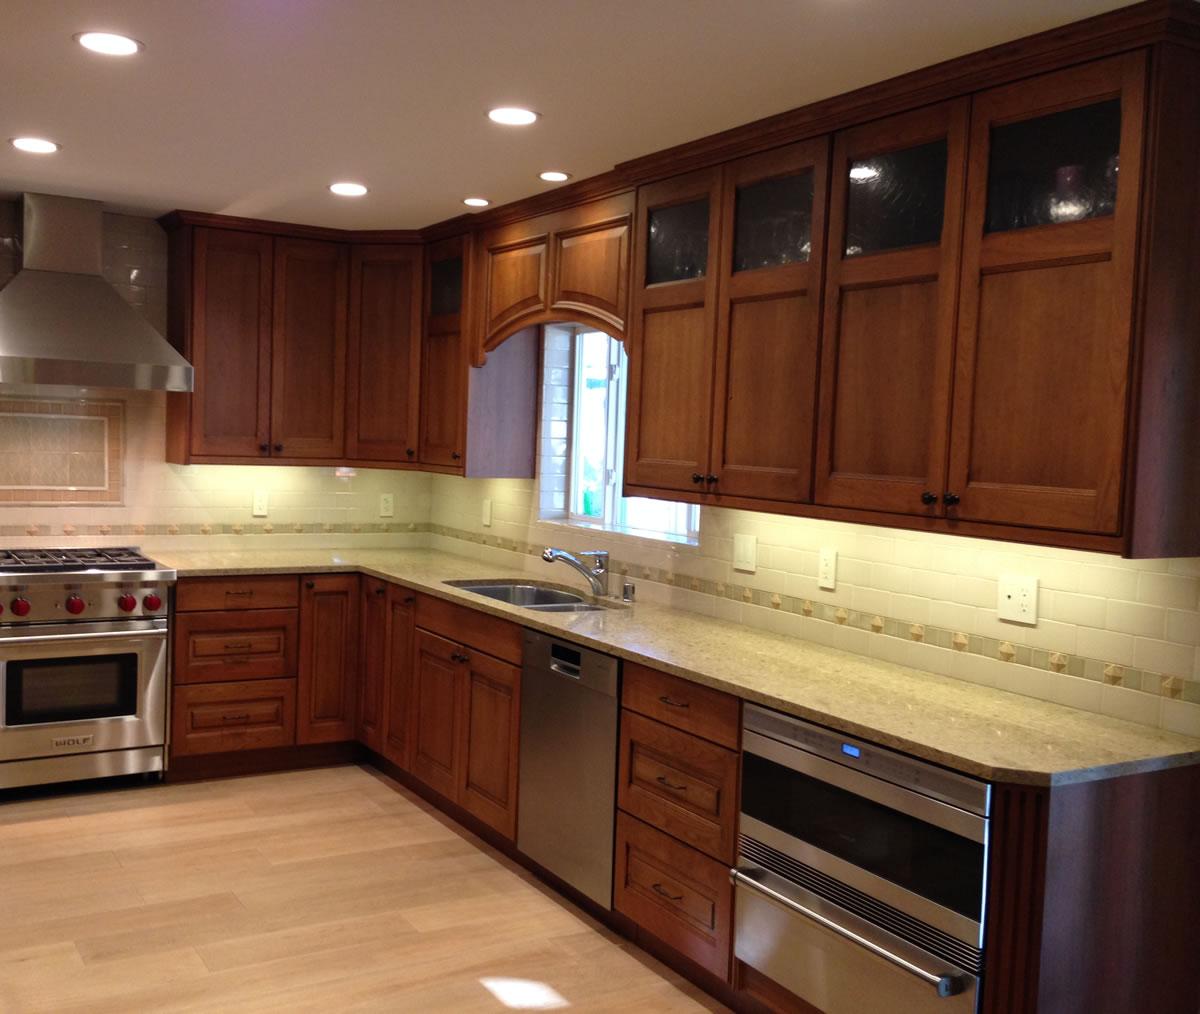 Huntington Beach Remodel 2014 | Le Gourmet Kitchen Ltd.